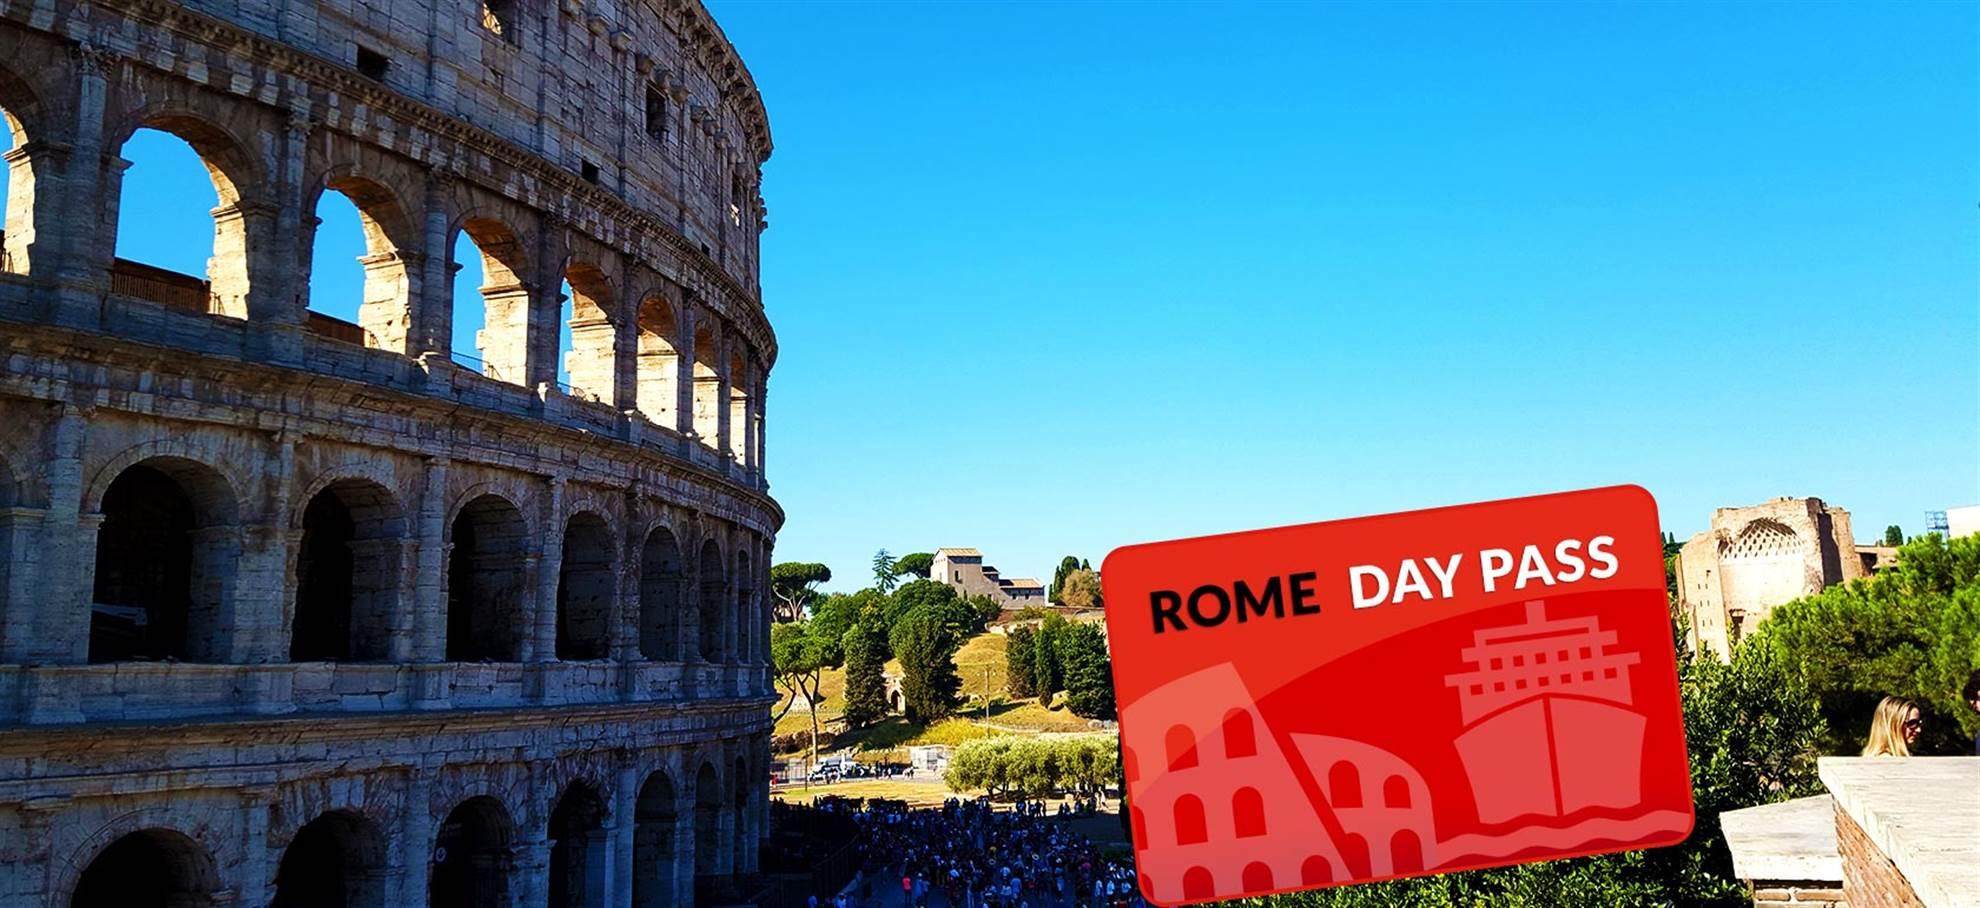 Passe diário de Roma (Rome Day Pass) a partir de Civitavecchia (Porto de Roma)